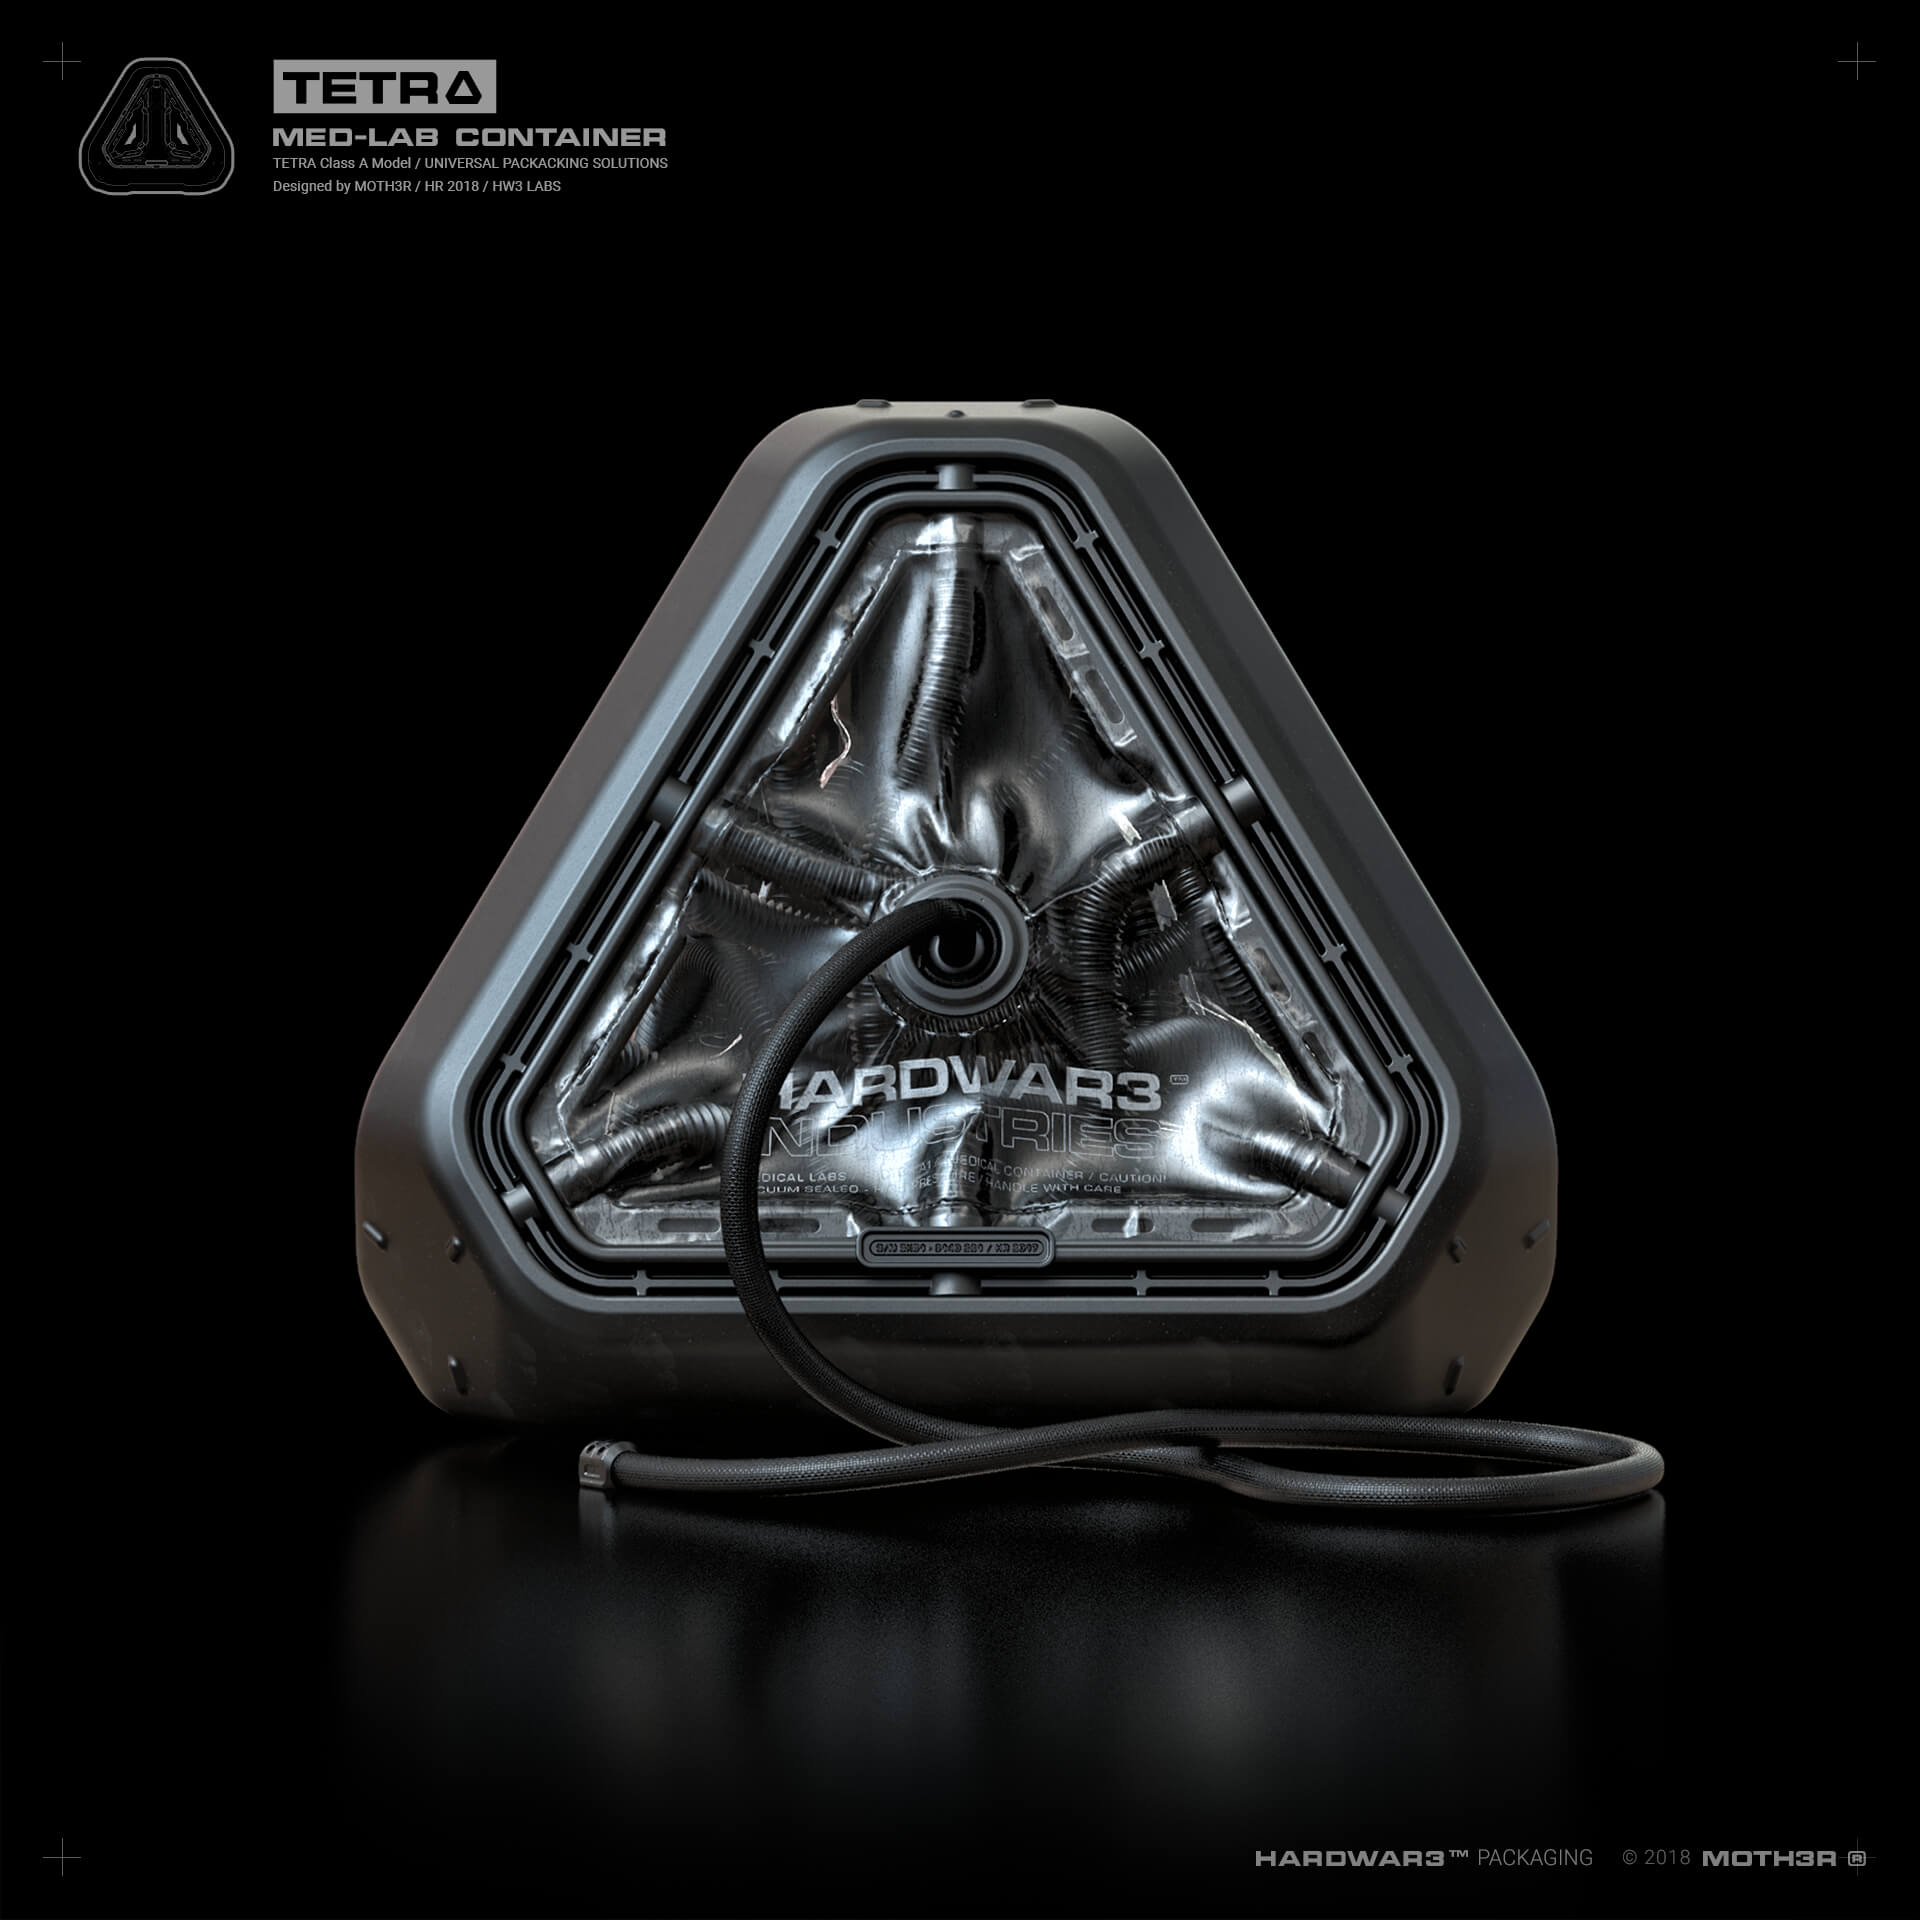 Tetra-b01.262